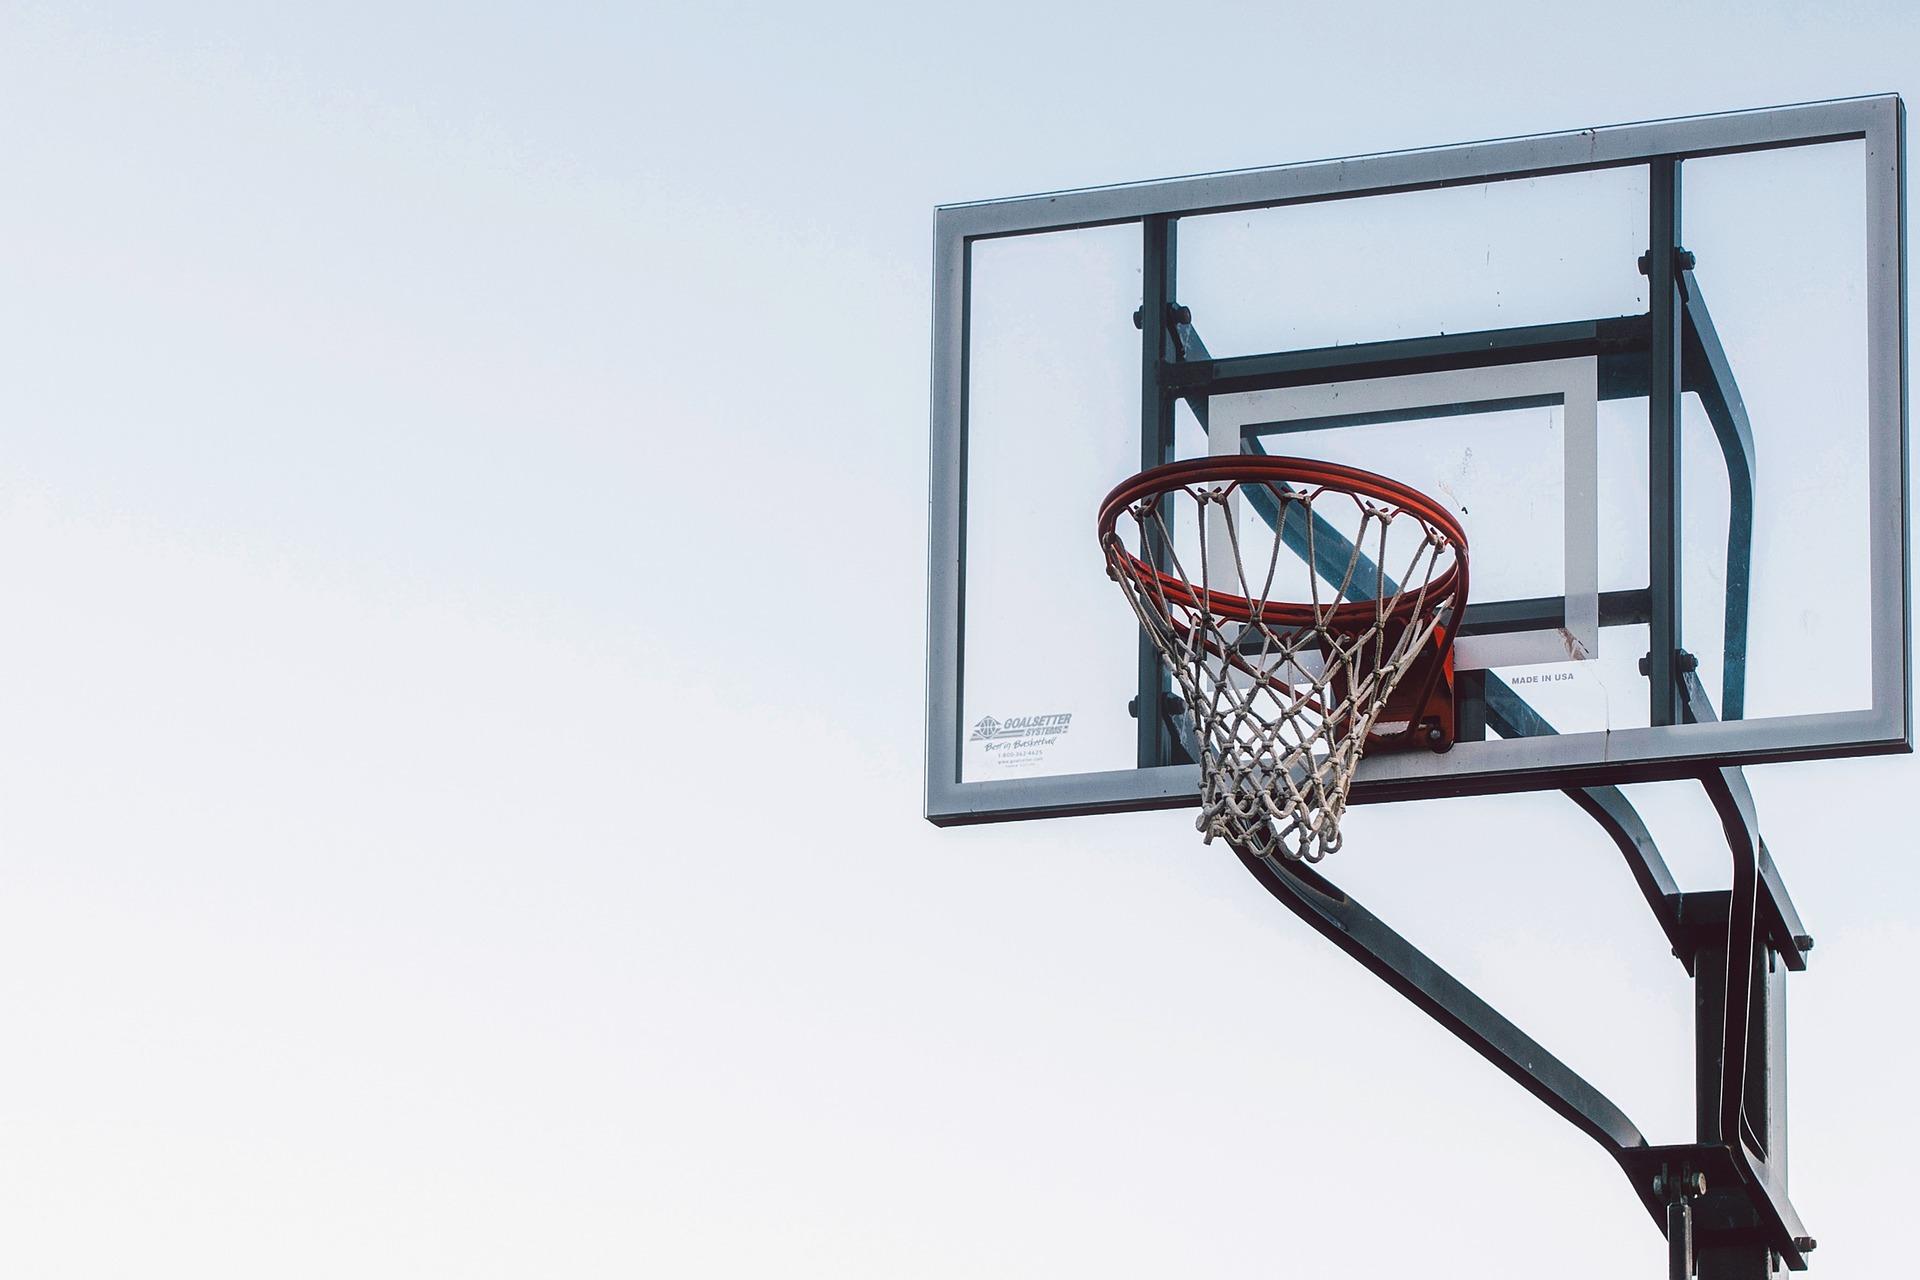 Canestro da basket da esterno